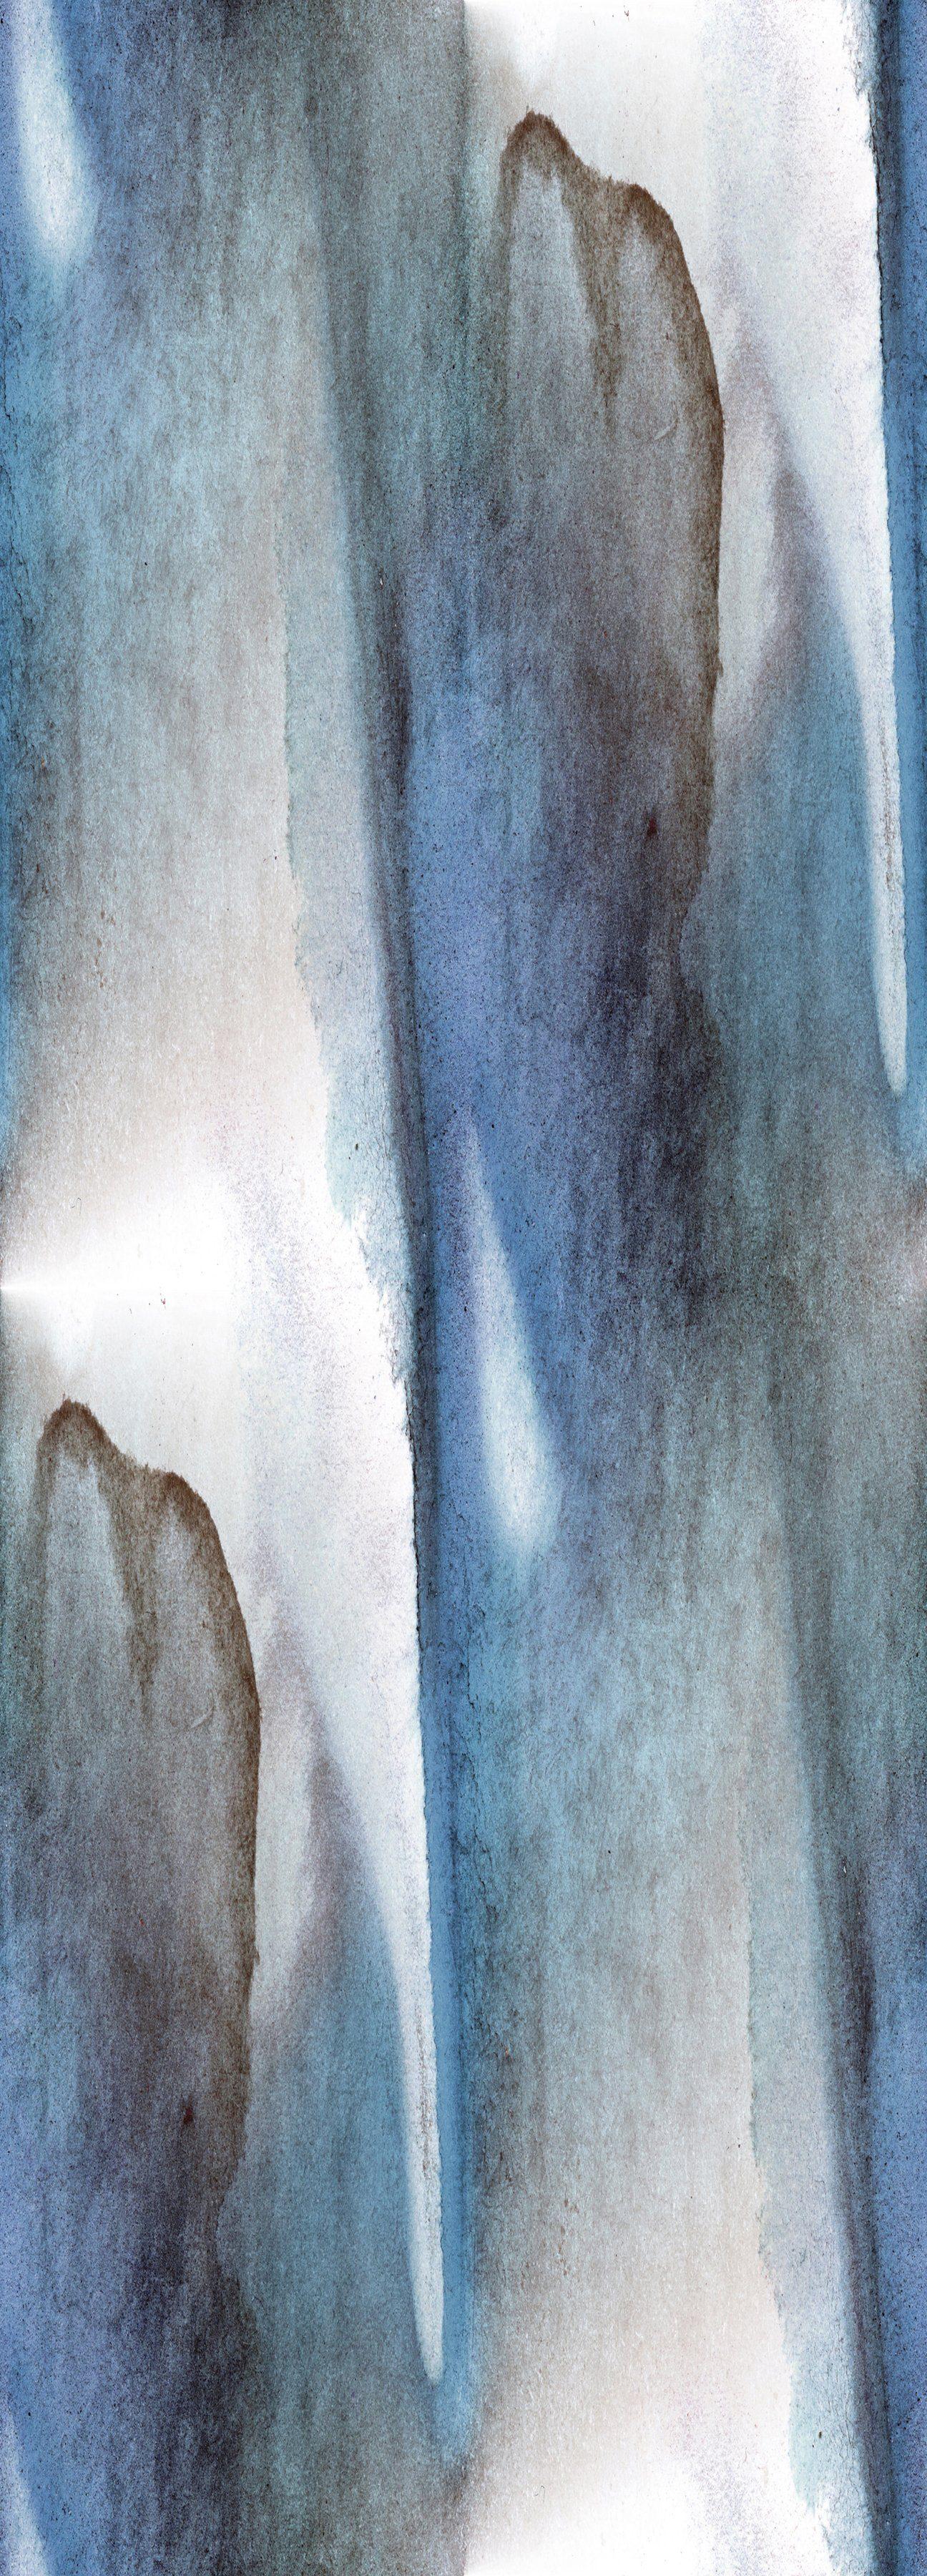 QUEENCE Vinyltapete »Emmou«, 90 x 250 cm, selbstklebend